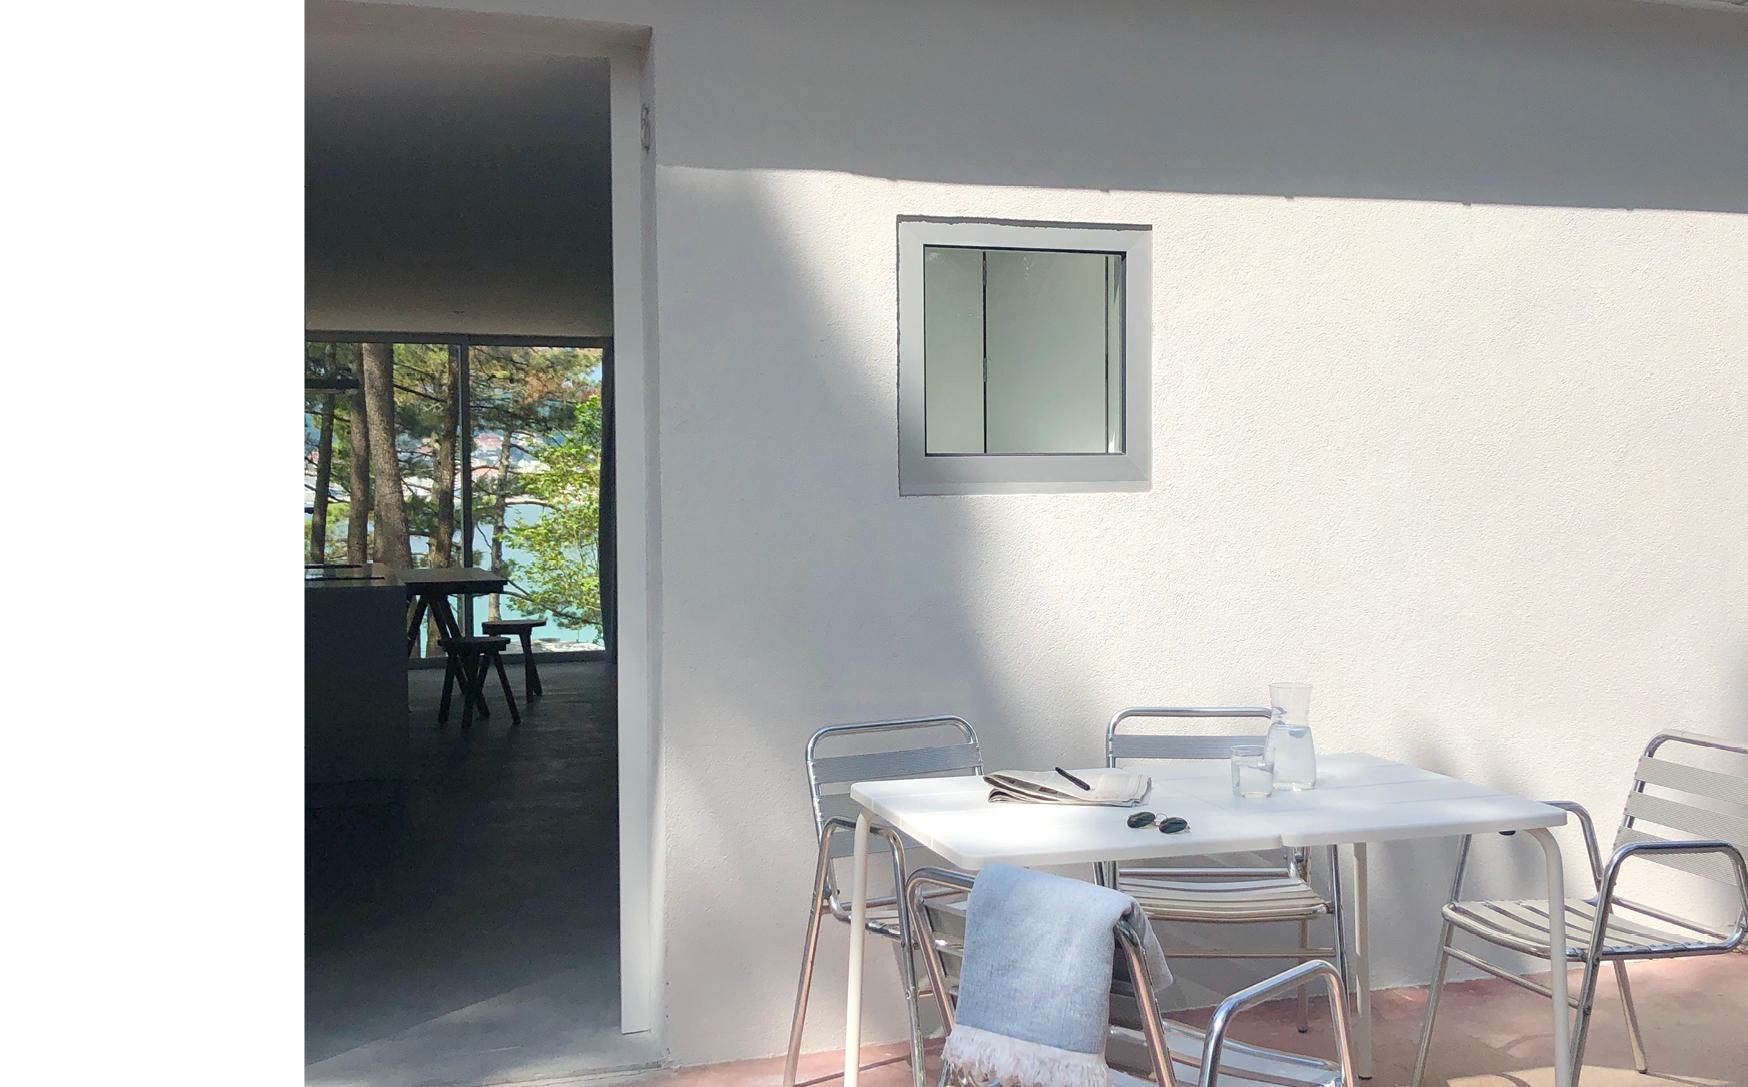 Coroso_Apartamentos de Verano_2.jpg